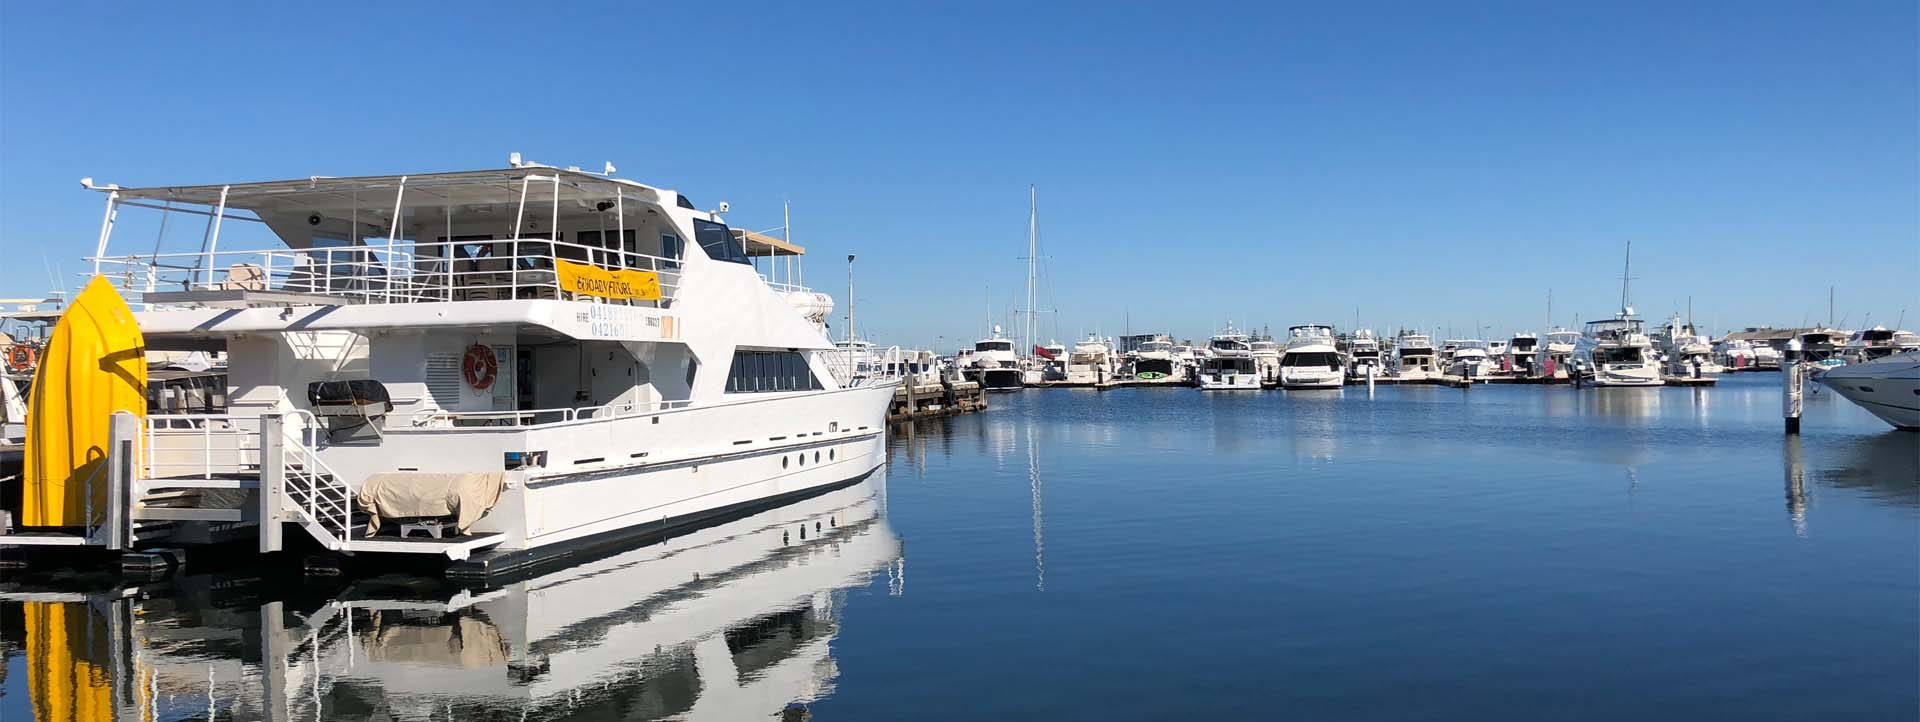 ECO ADVENTURE TOURISM boat side profile